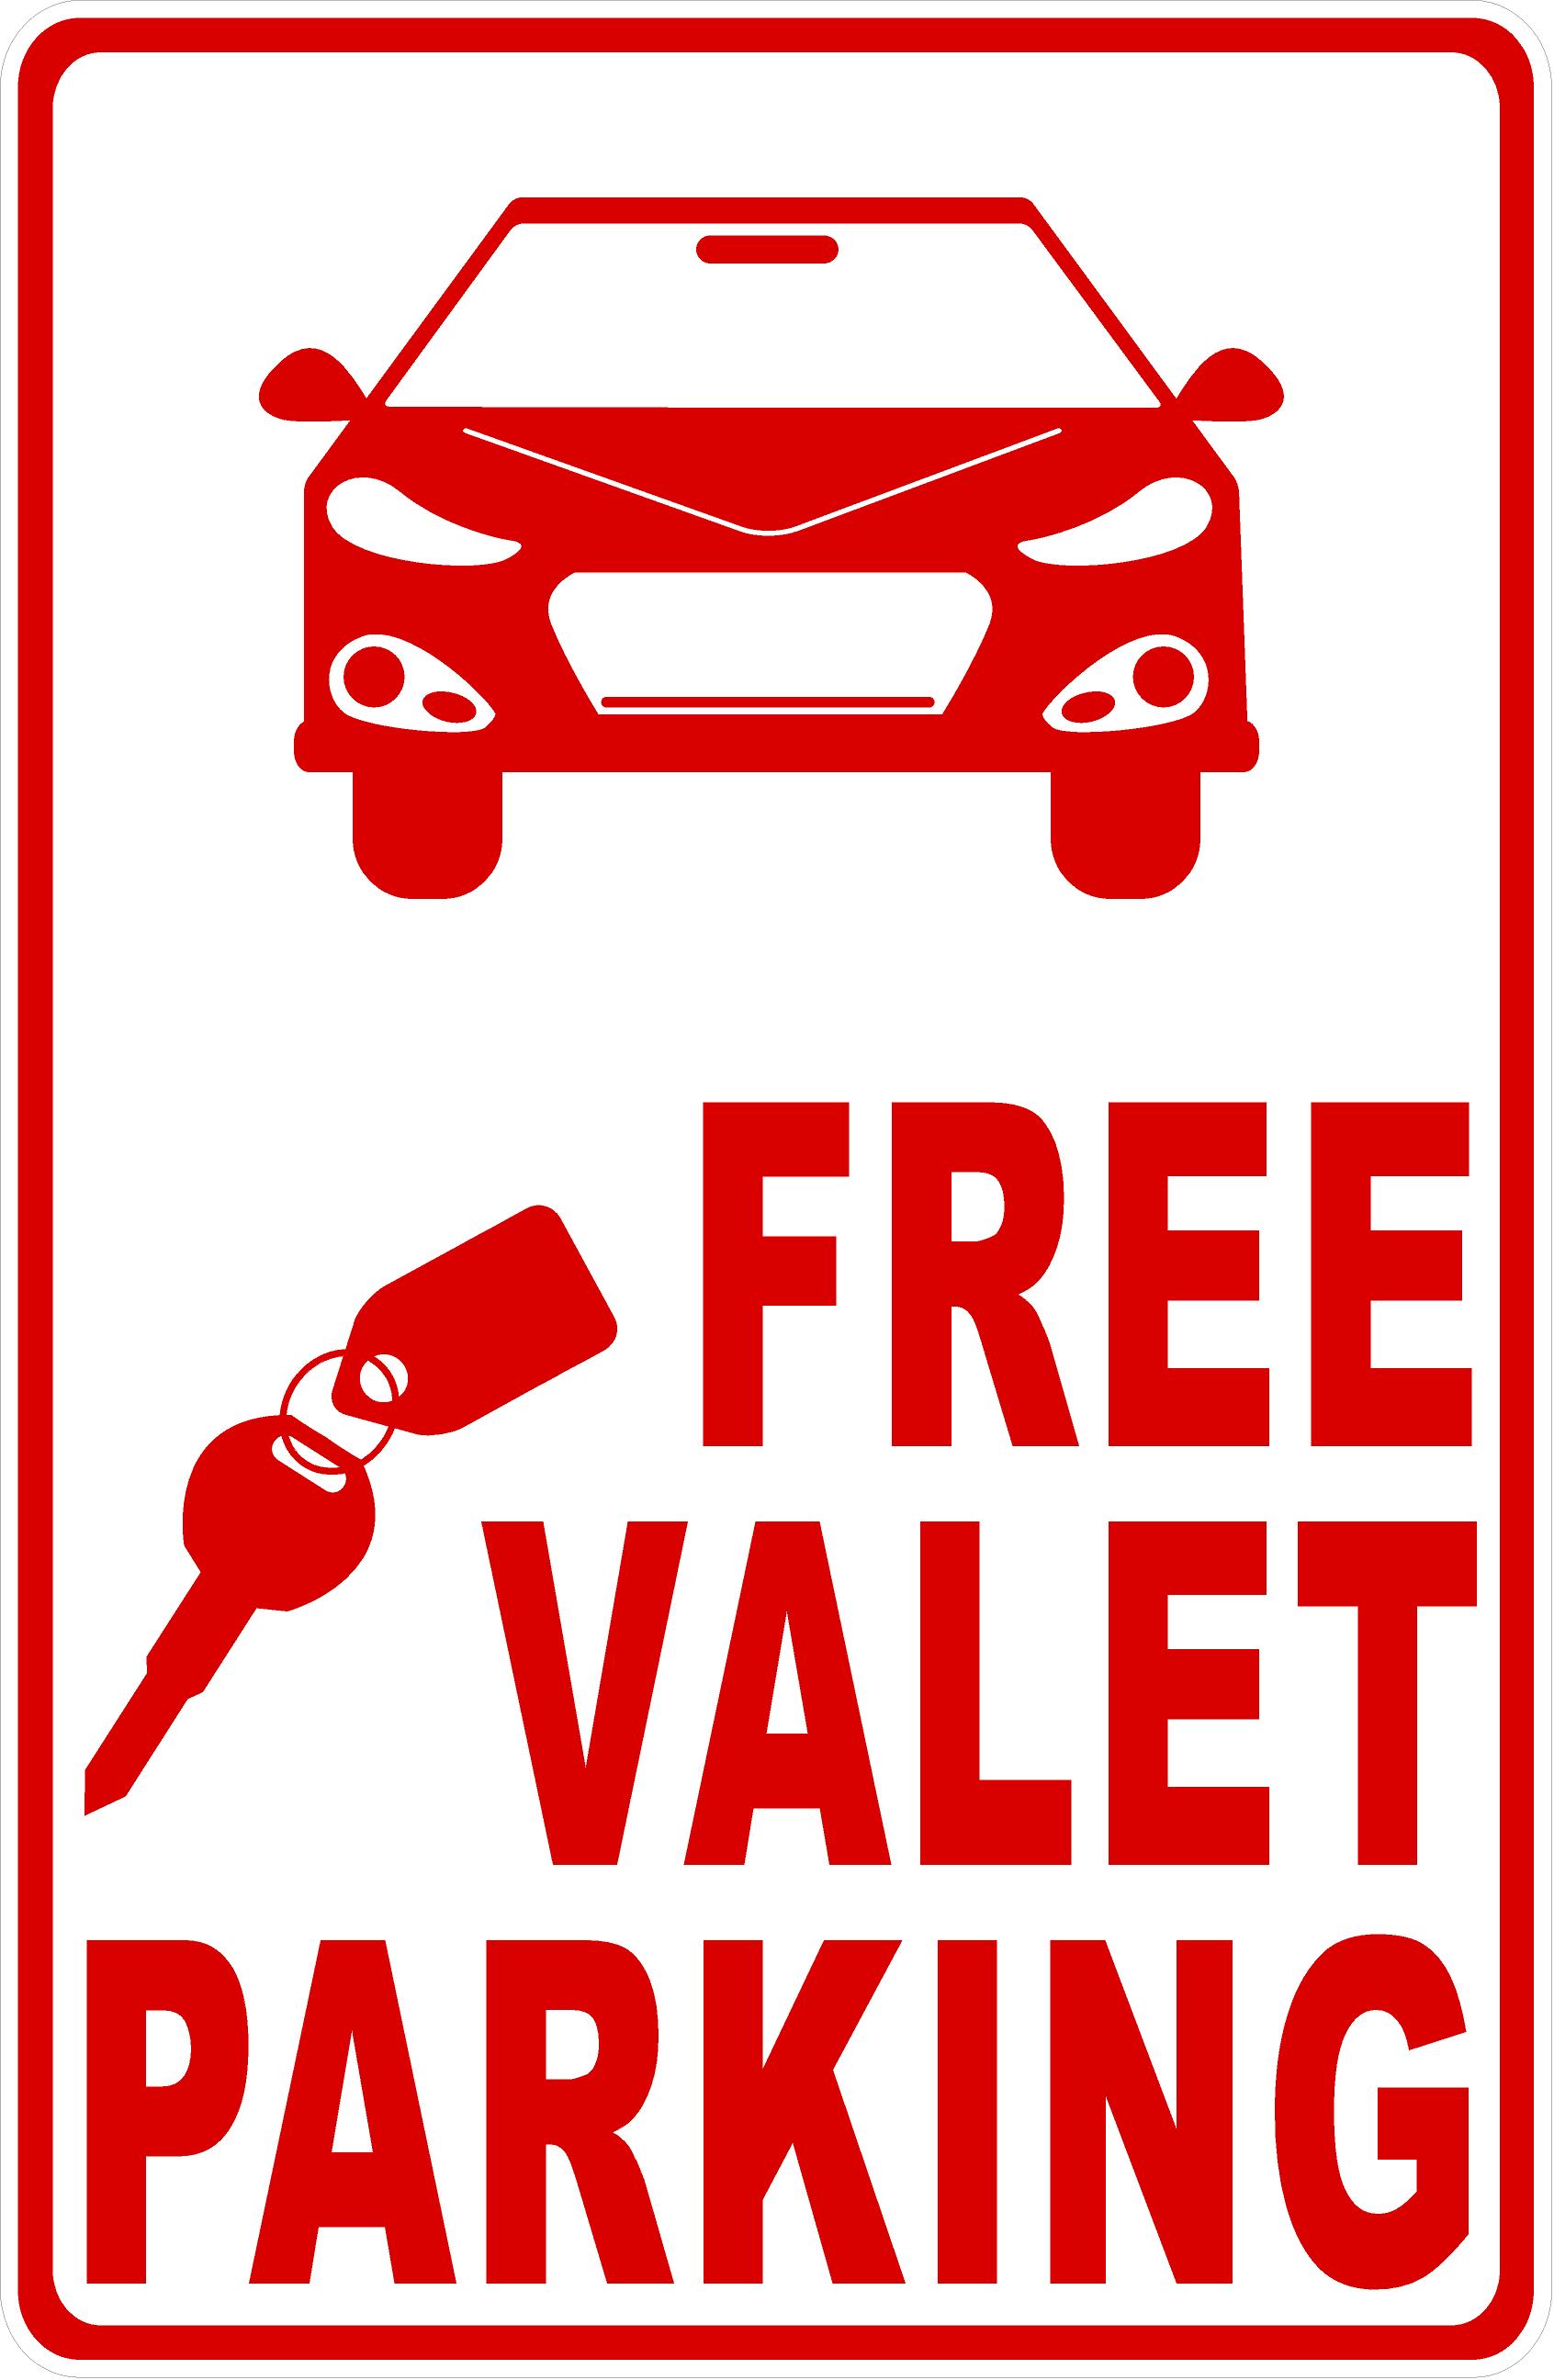 Free Valet Parking Business Sign Business Signs Valet Industrial Grade